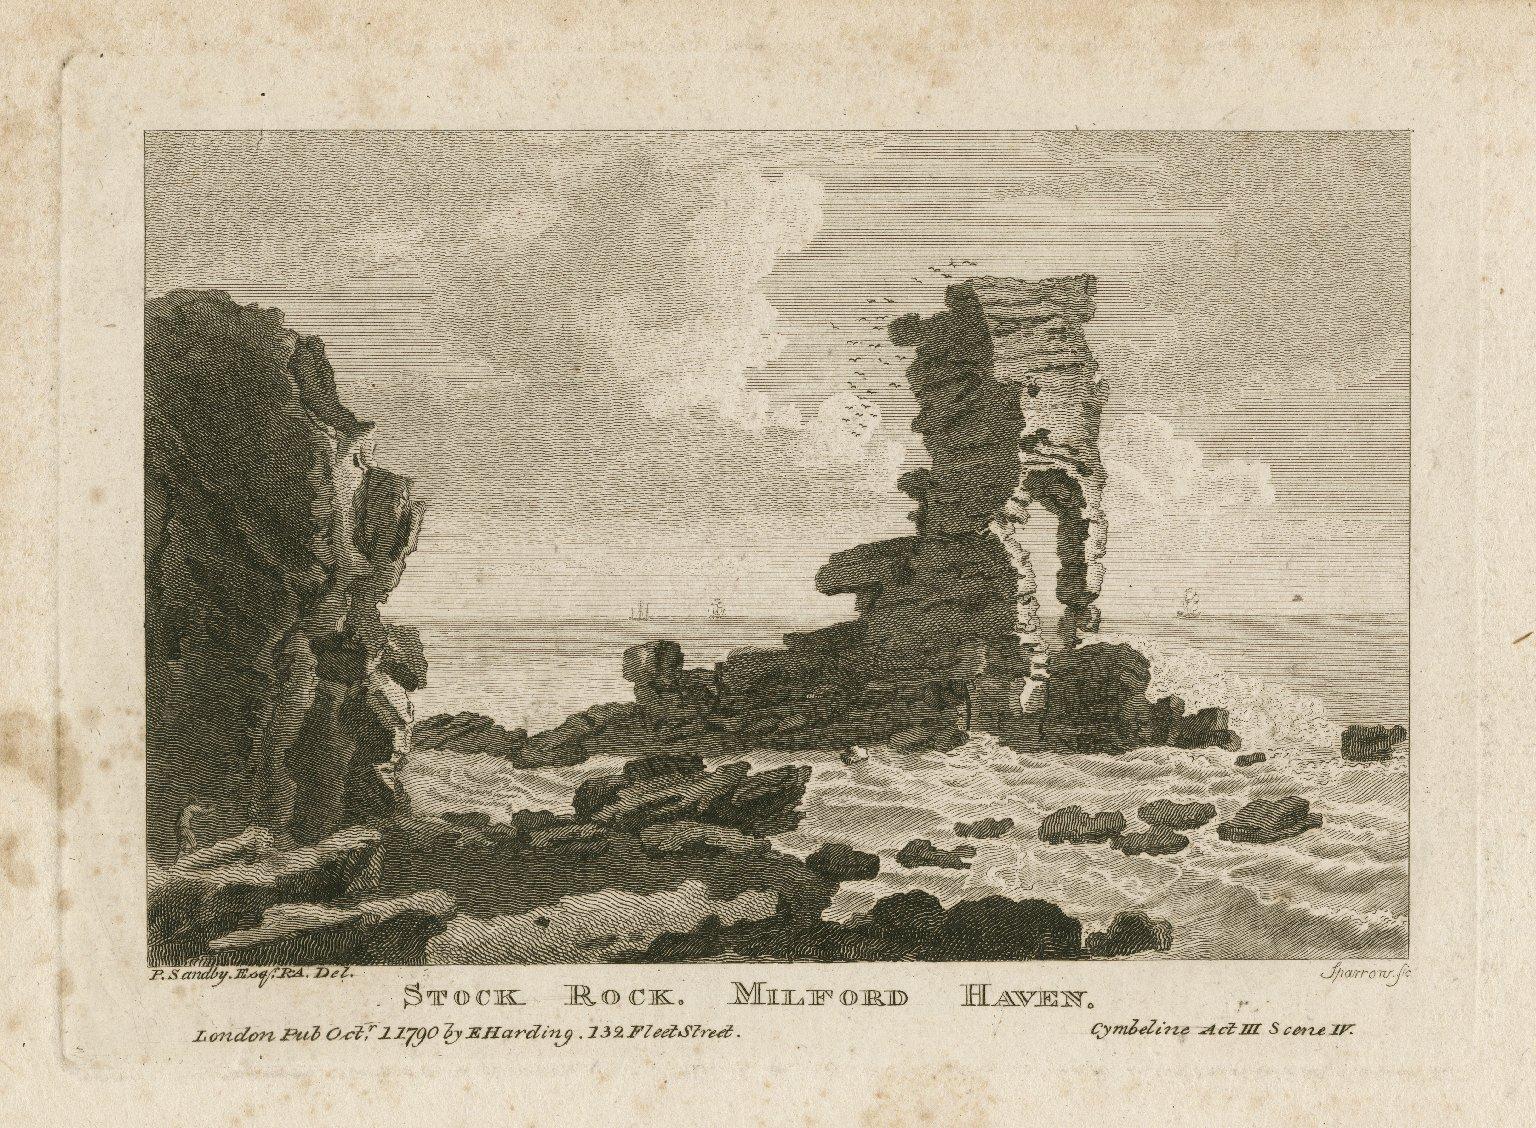 Stock Rock, Milford Haven, Cymbeline, act III, scene i [graphic] / P. Sandby, Esq. R.A. del. ; Sparrow, sc.